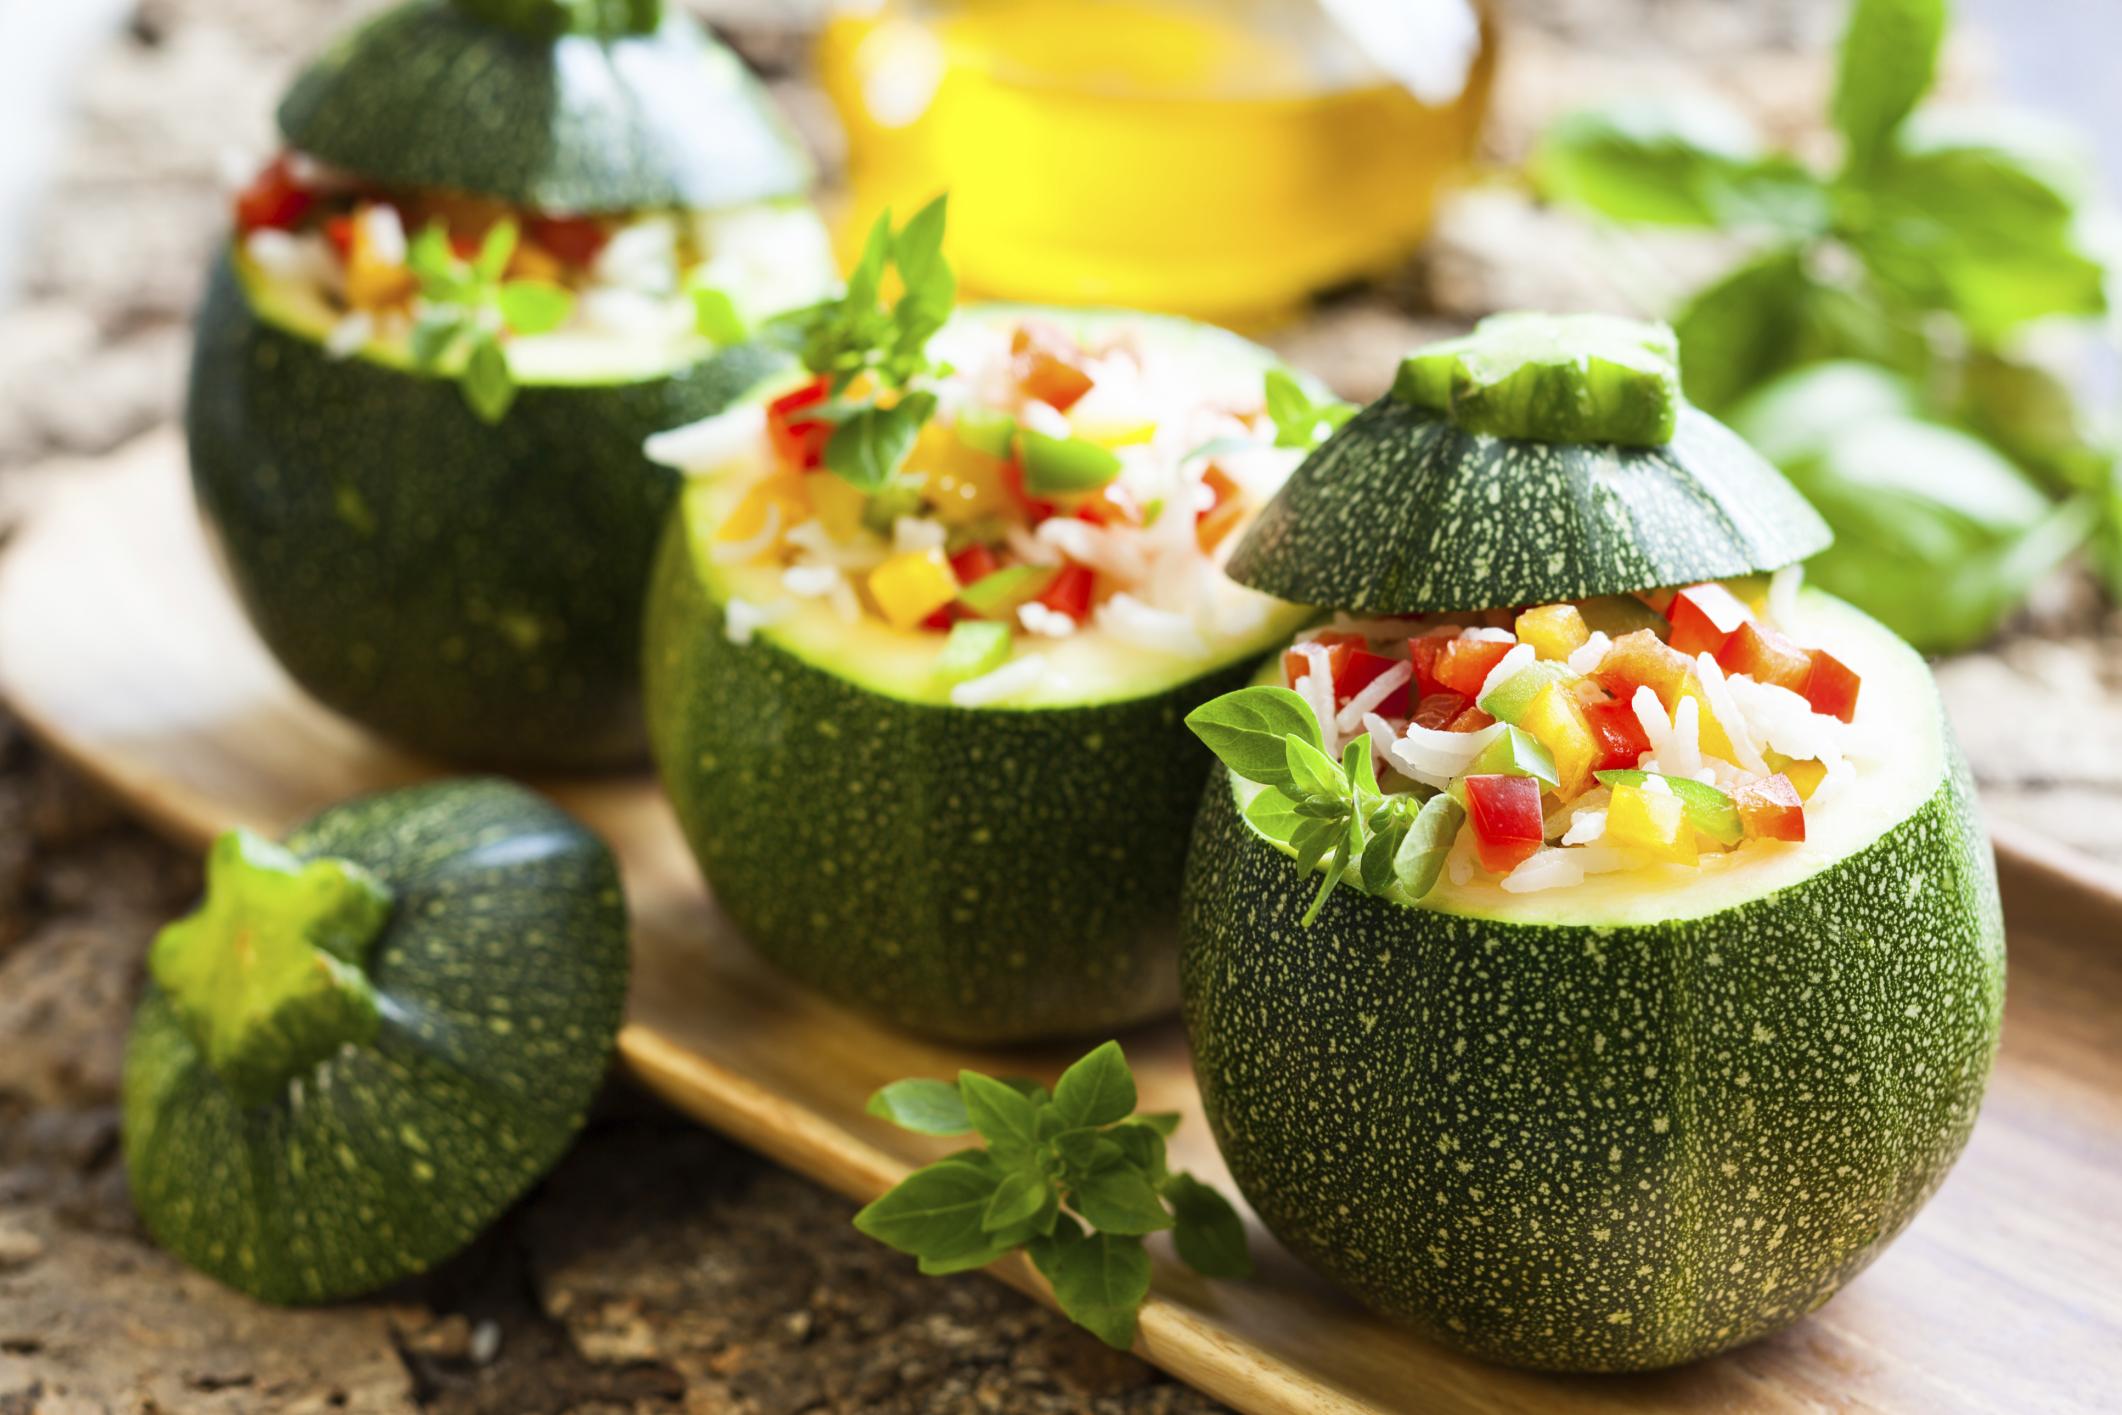 verdure ripiene vegetariane